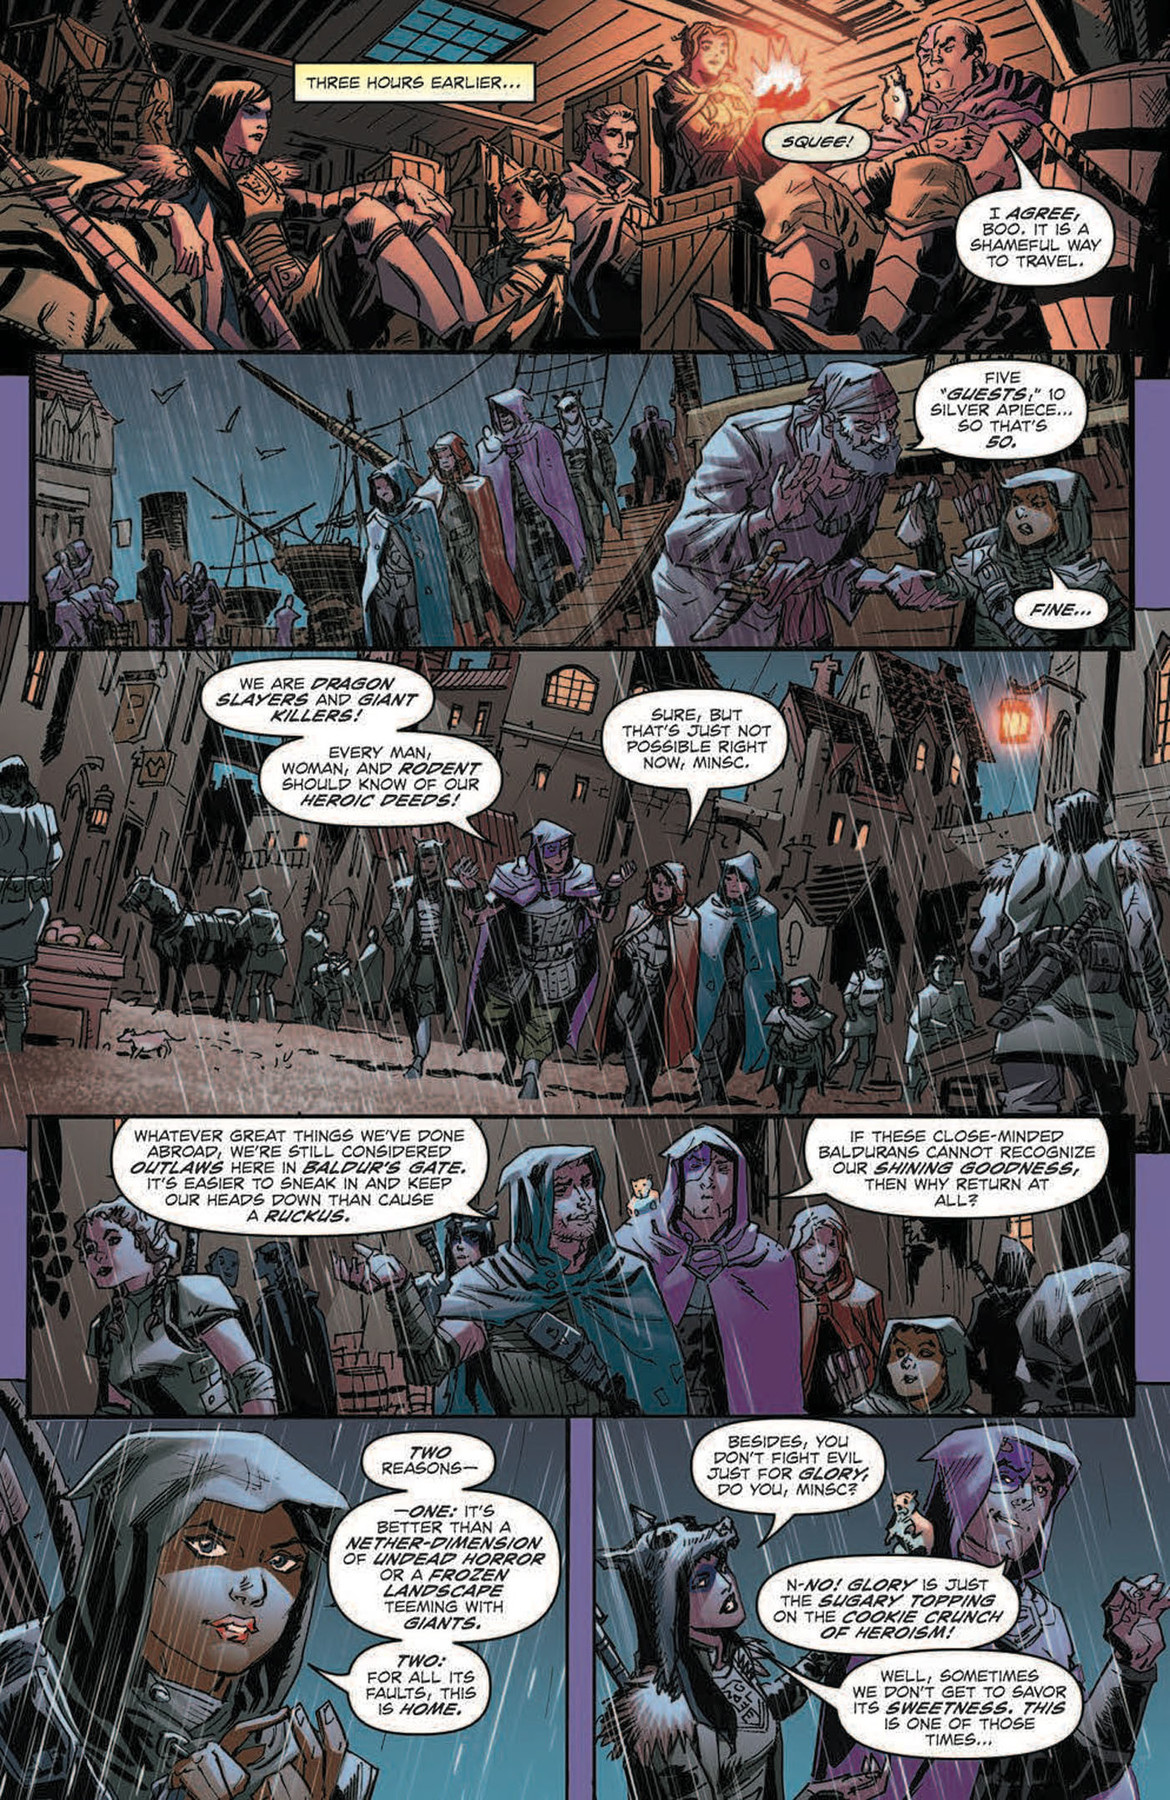 dungeons_and_dragons_evil_at_baldurs_gate_page_3.jpg